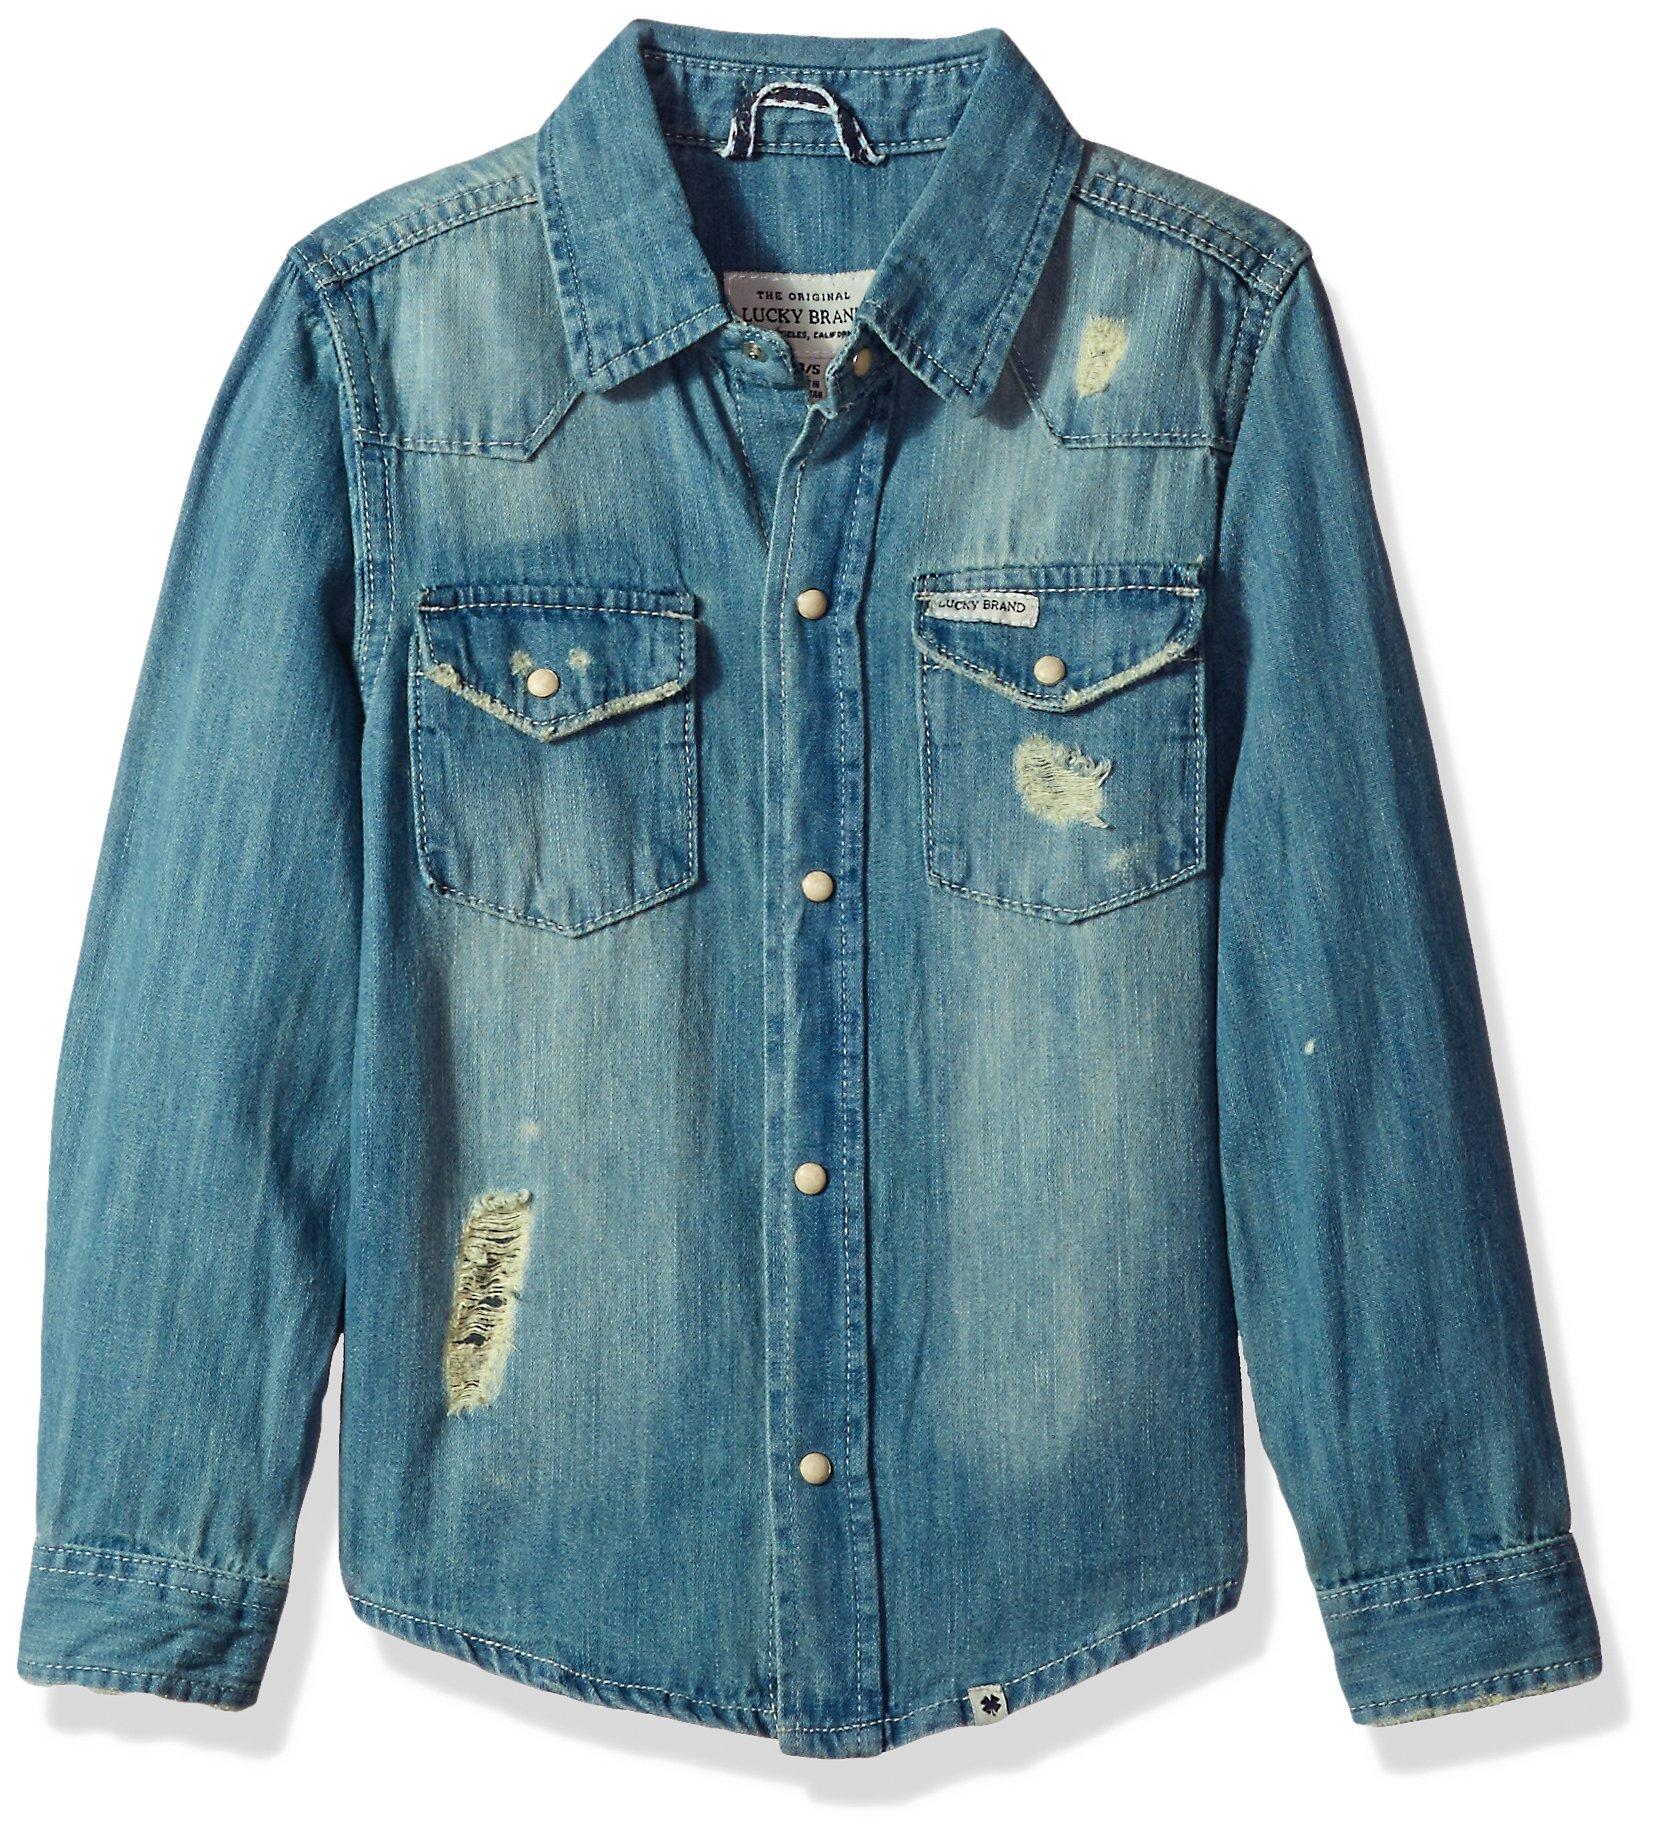 Lucky Brand Toddler Boys' Long Sleeve Light Denim Shirt, Light Blue, 3T